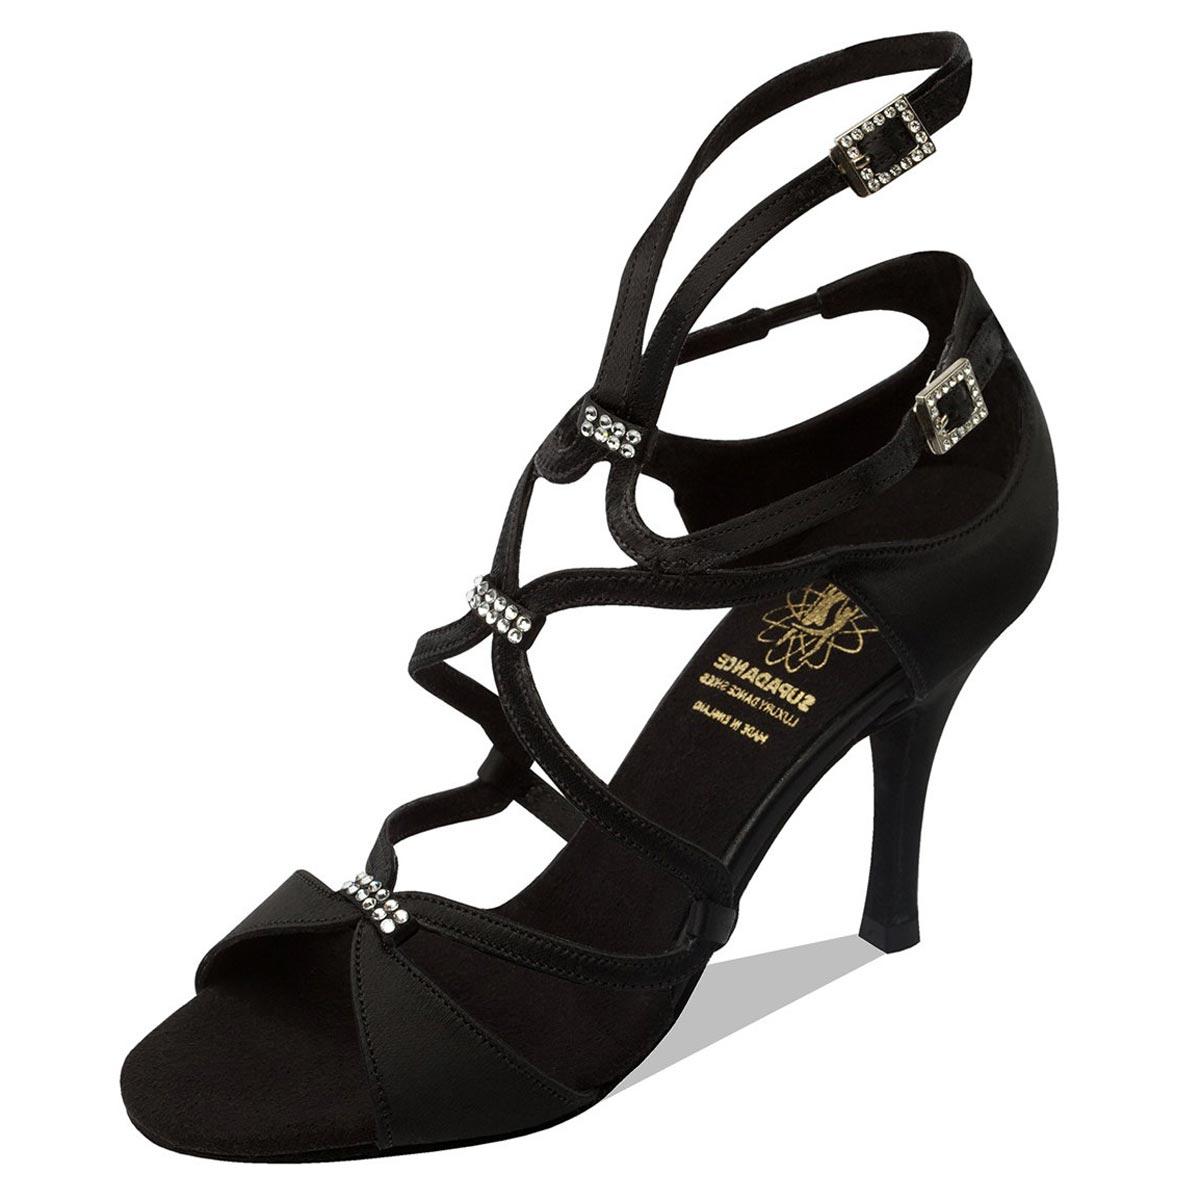 Supadance Shoes Sale